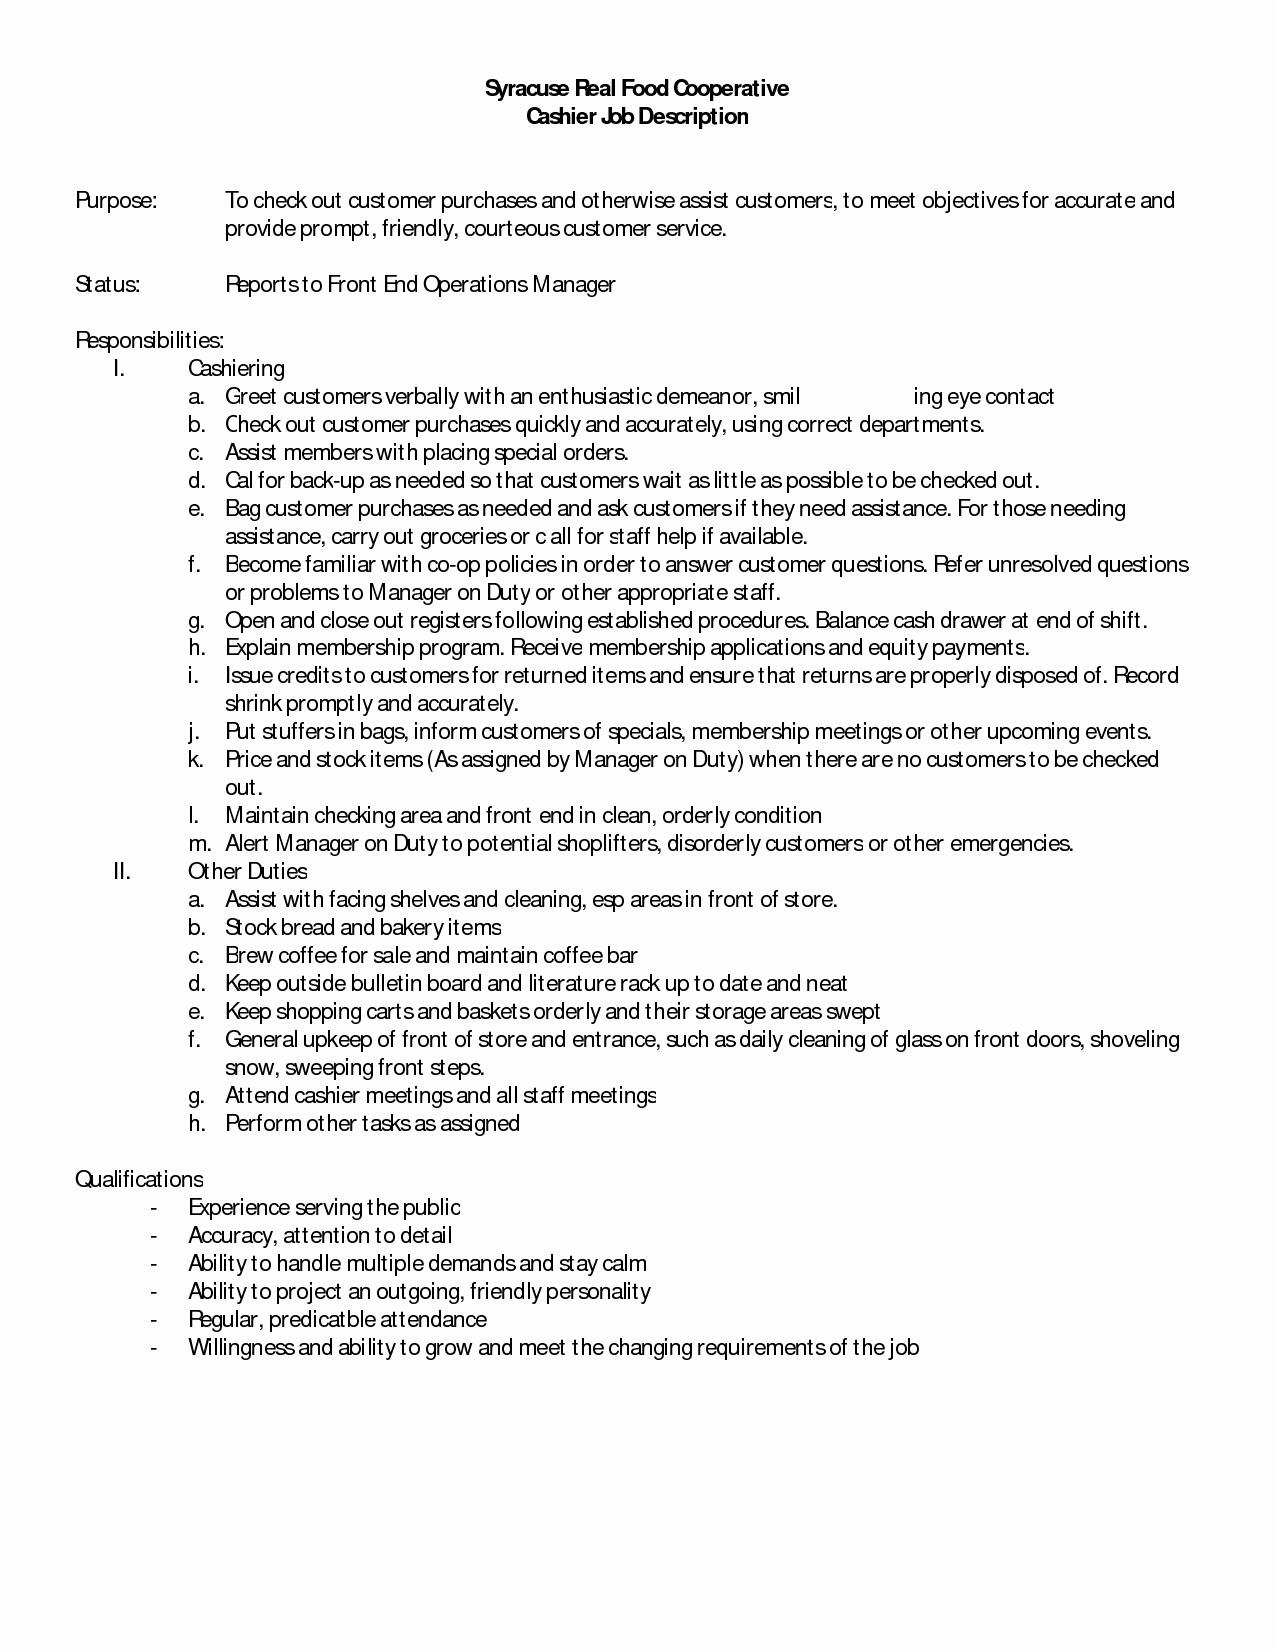 10 Cashier Job Description for Resume Sample